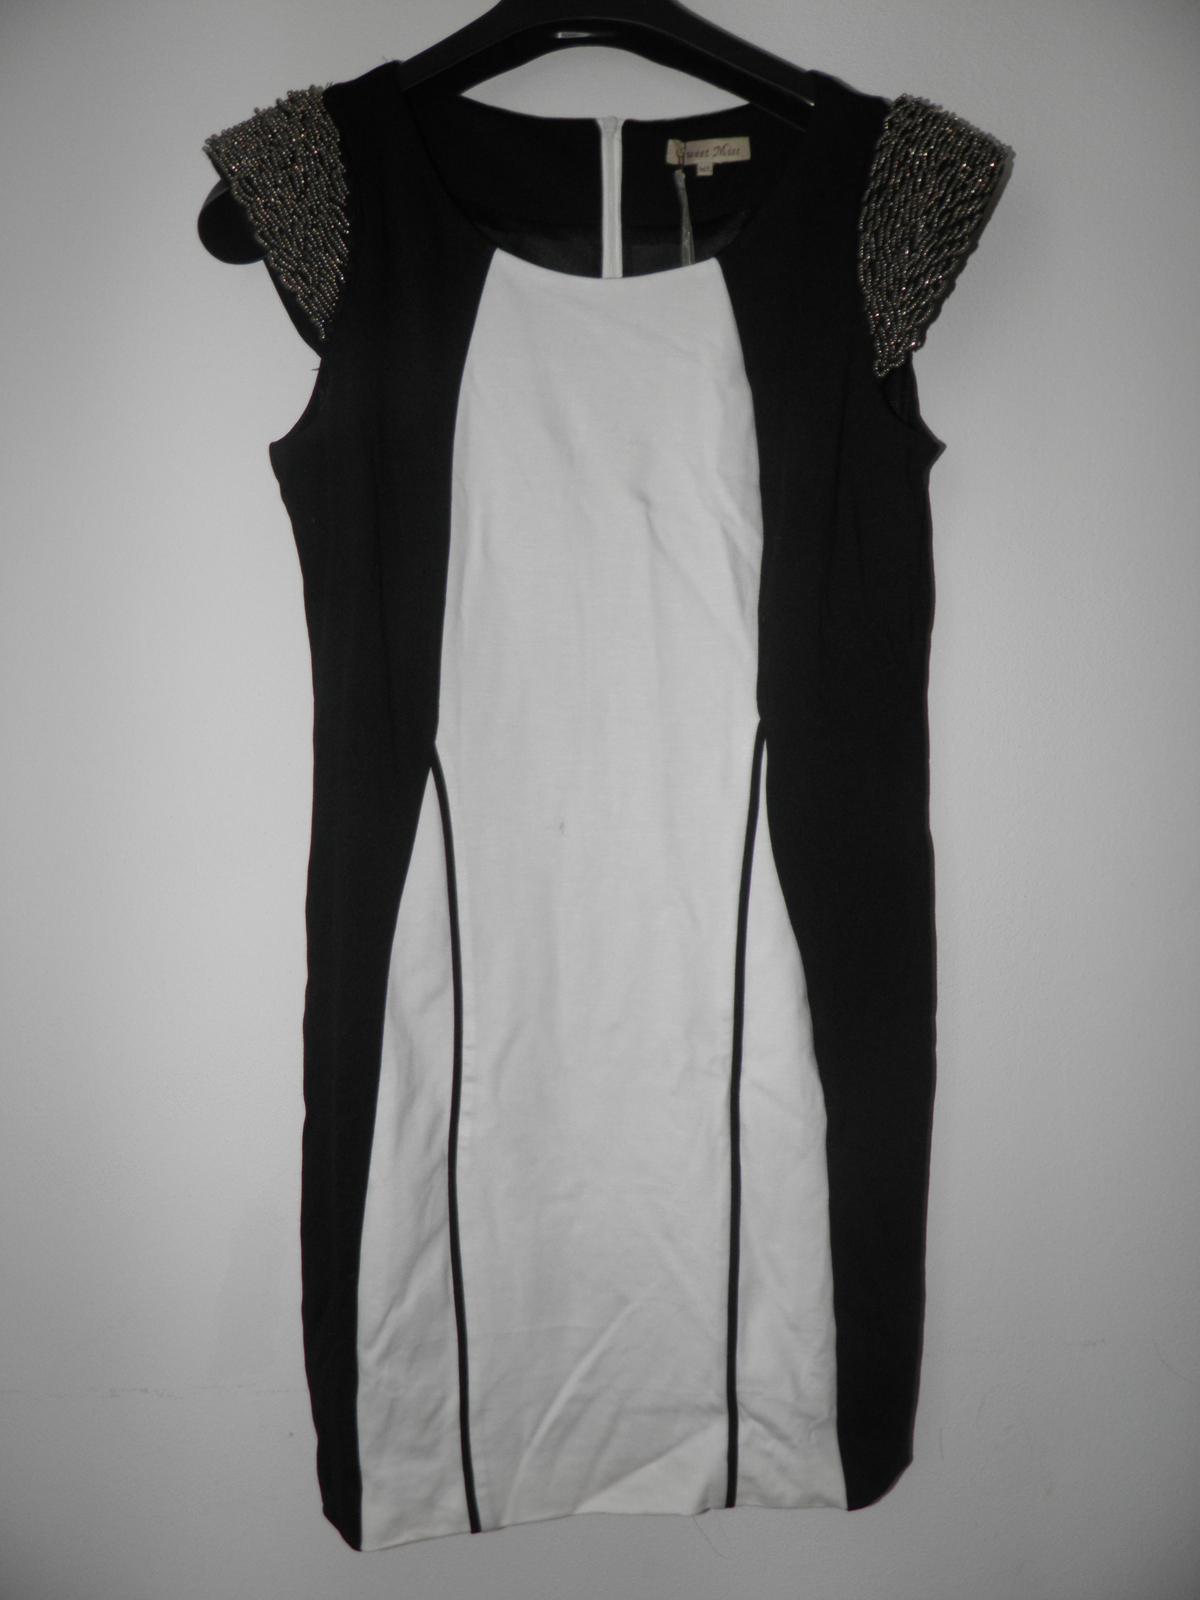 luxusné šaty z butiku, sedia na L/XL - Obrázok č. 1